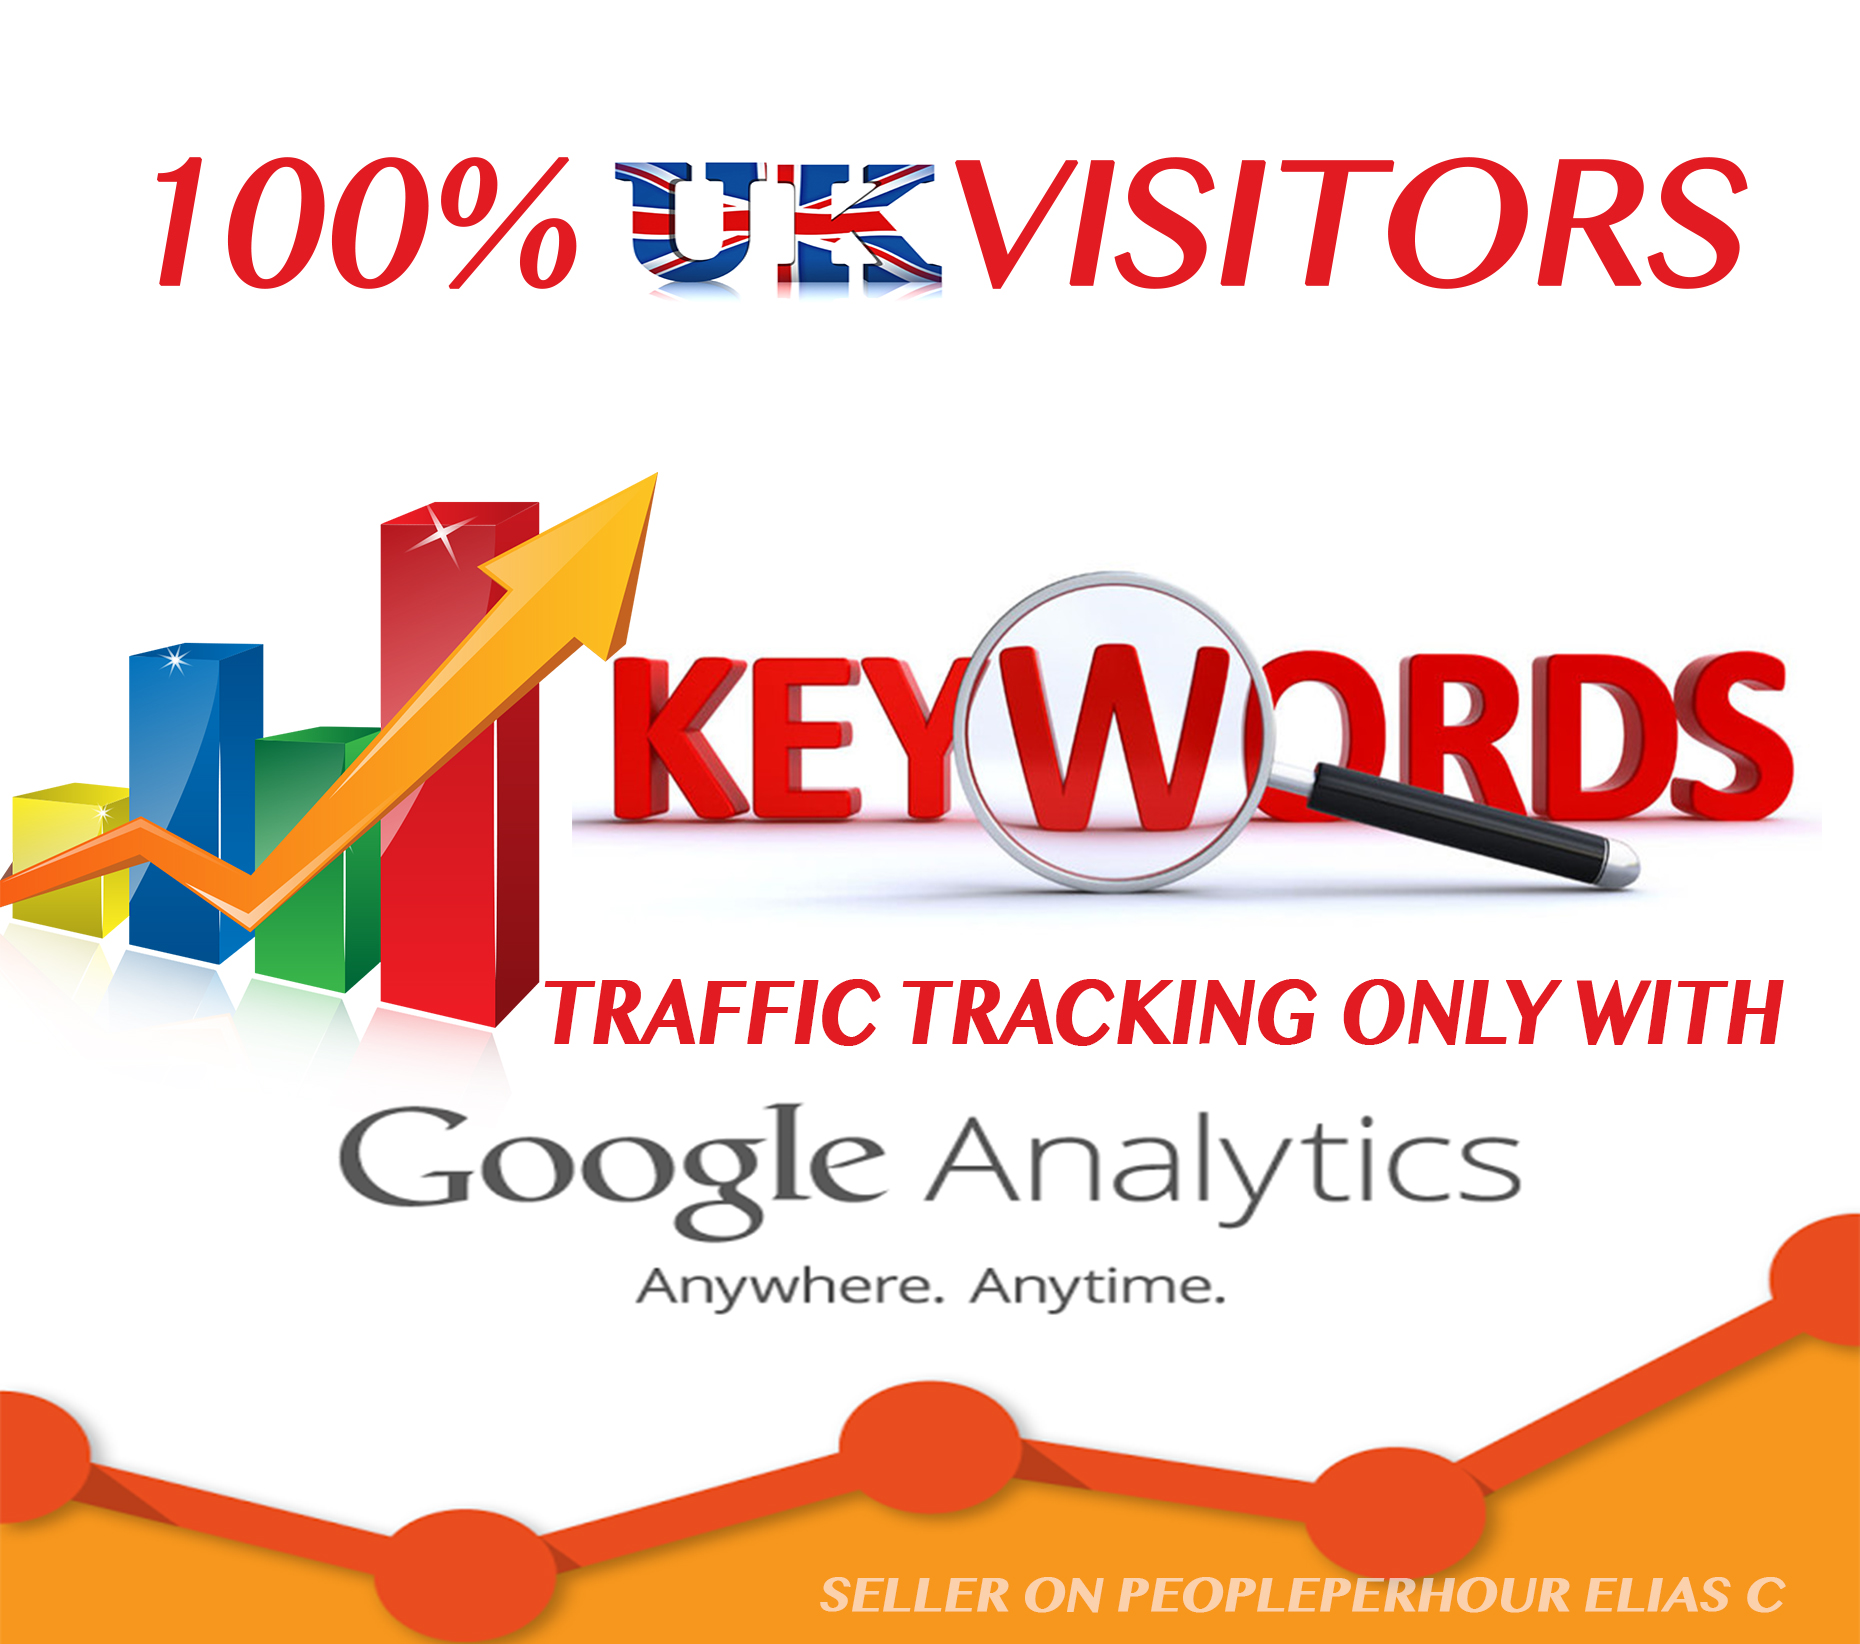 We can provide Keywords target traffic for 30 days